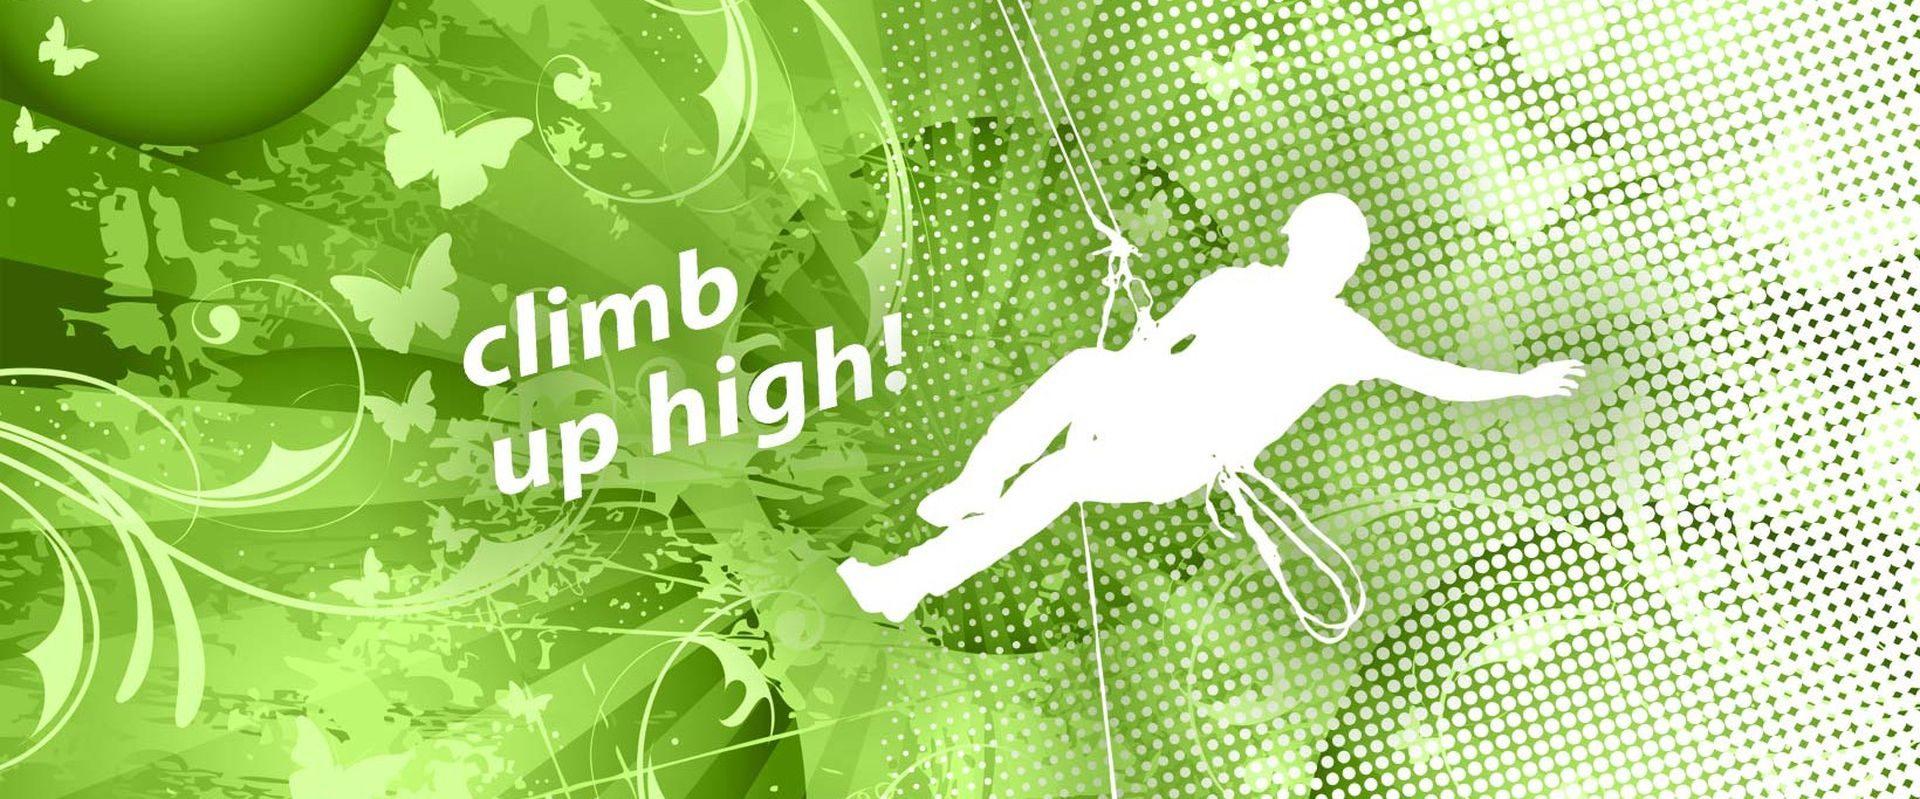 "Symbolisierter Kletterer und Schriftzug ""climb up high"""